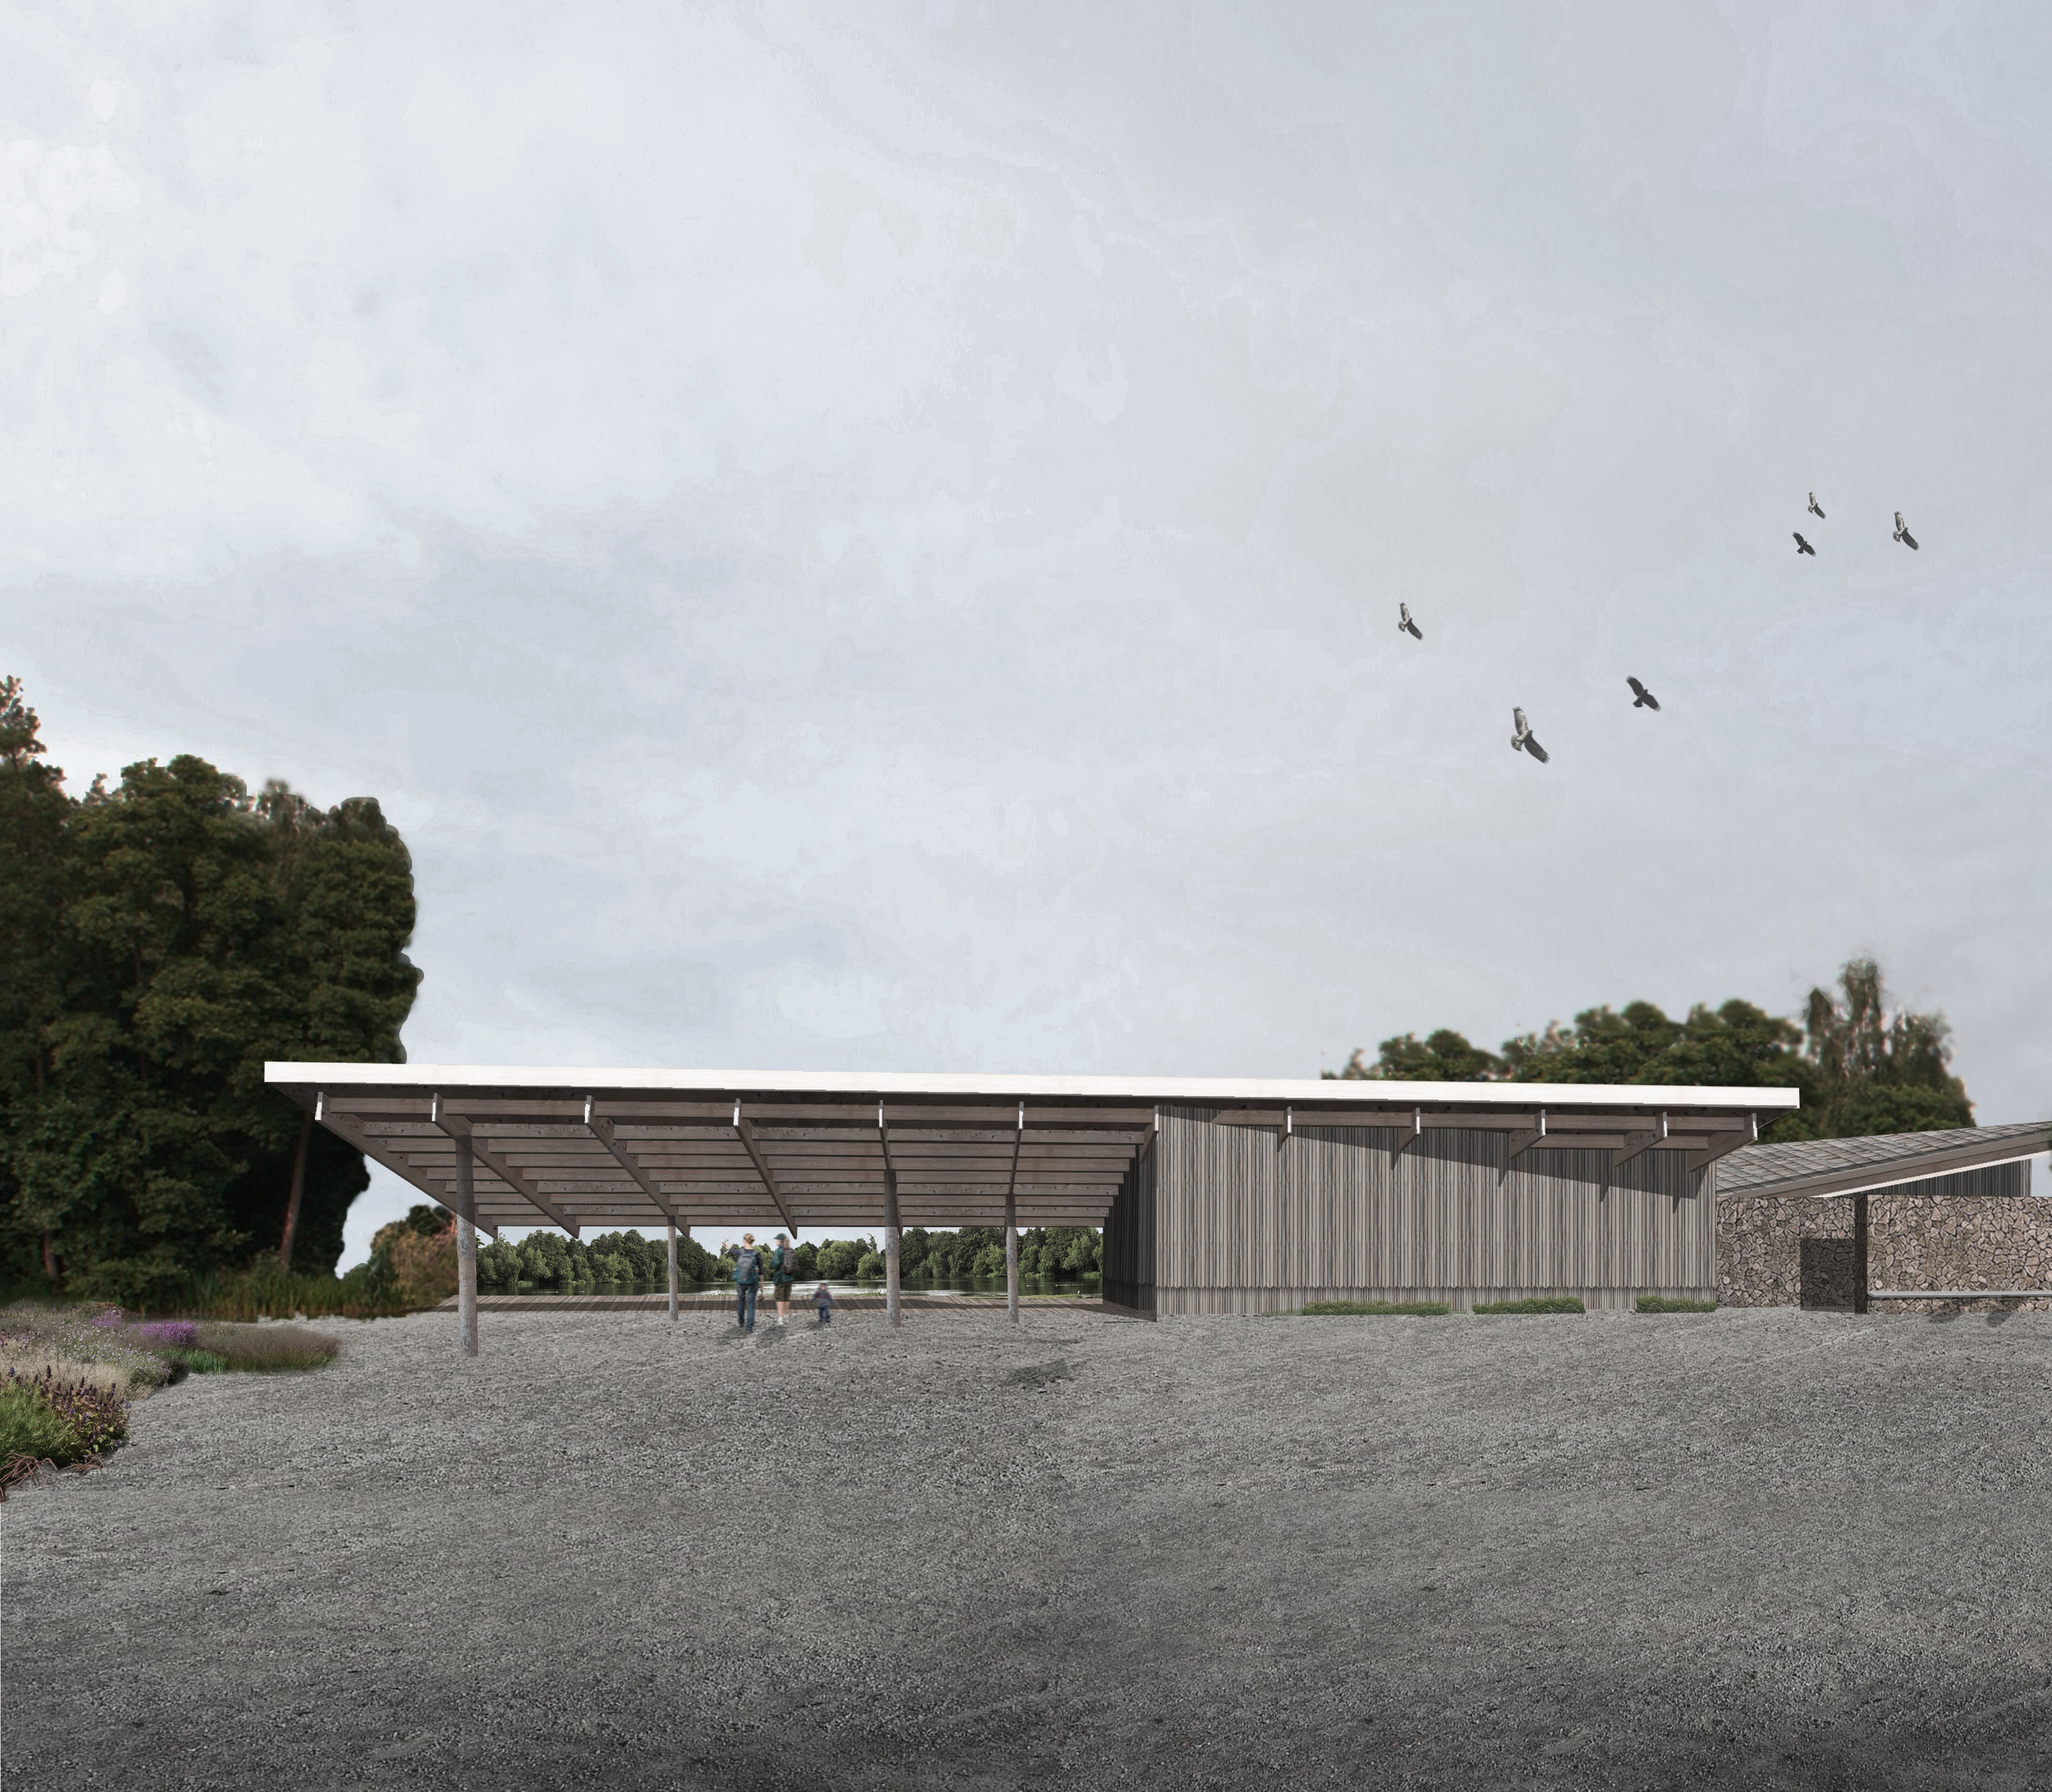 MOCT_Sevenoaks Nature & Wellbeing Centre_courtyard entrance1.jpg